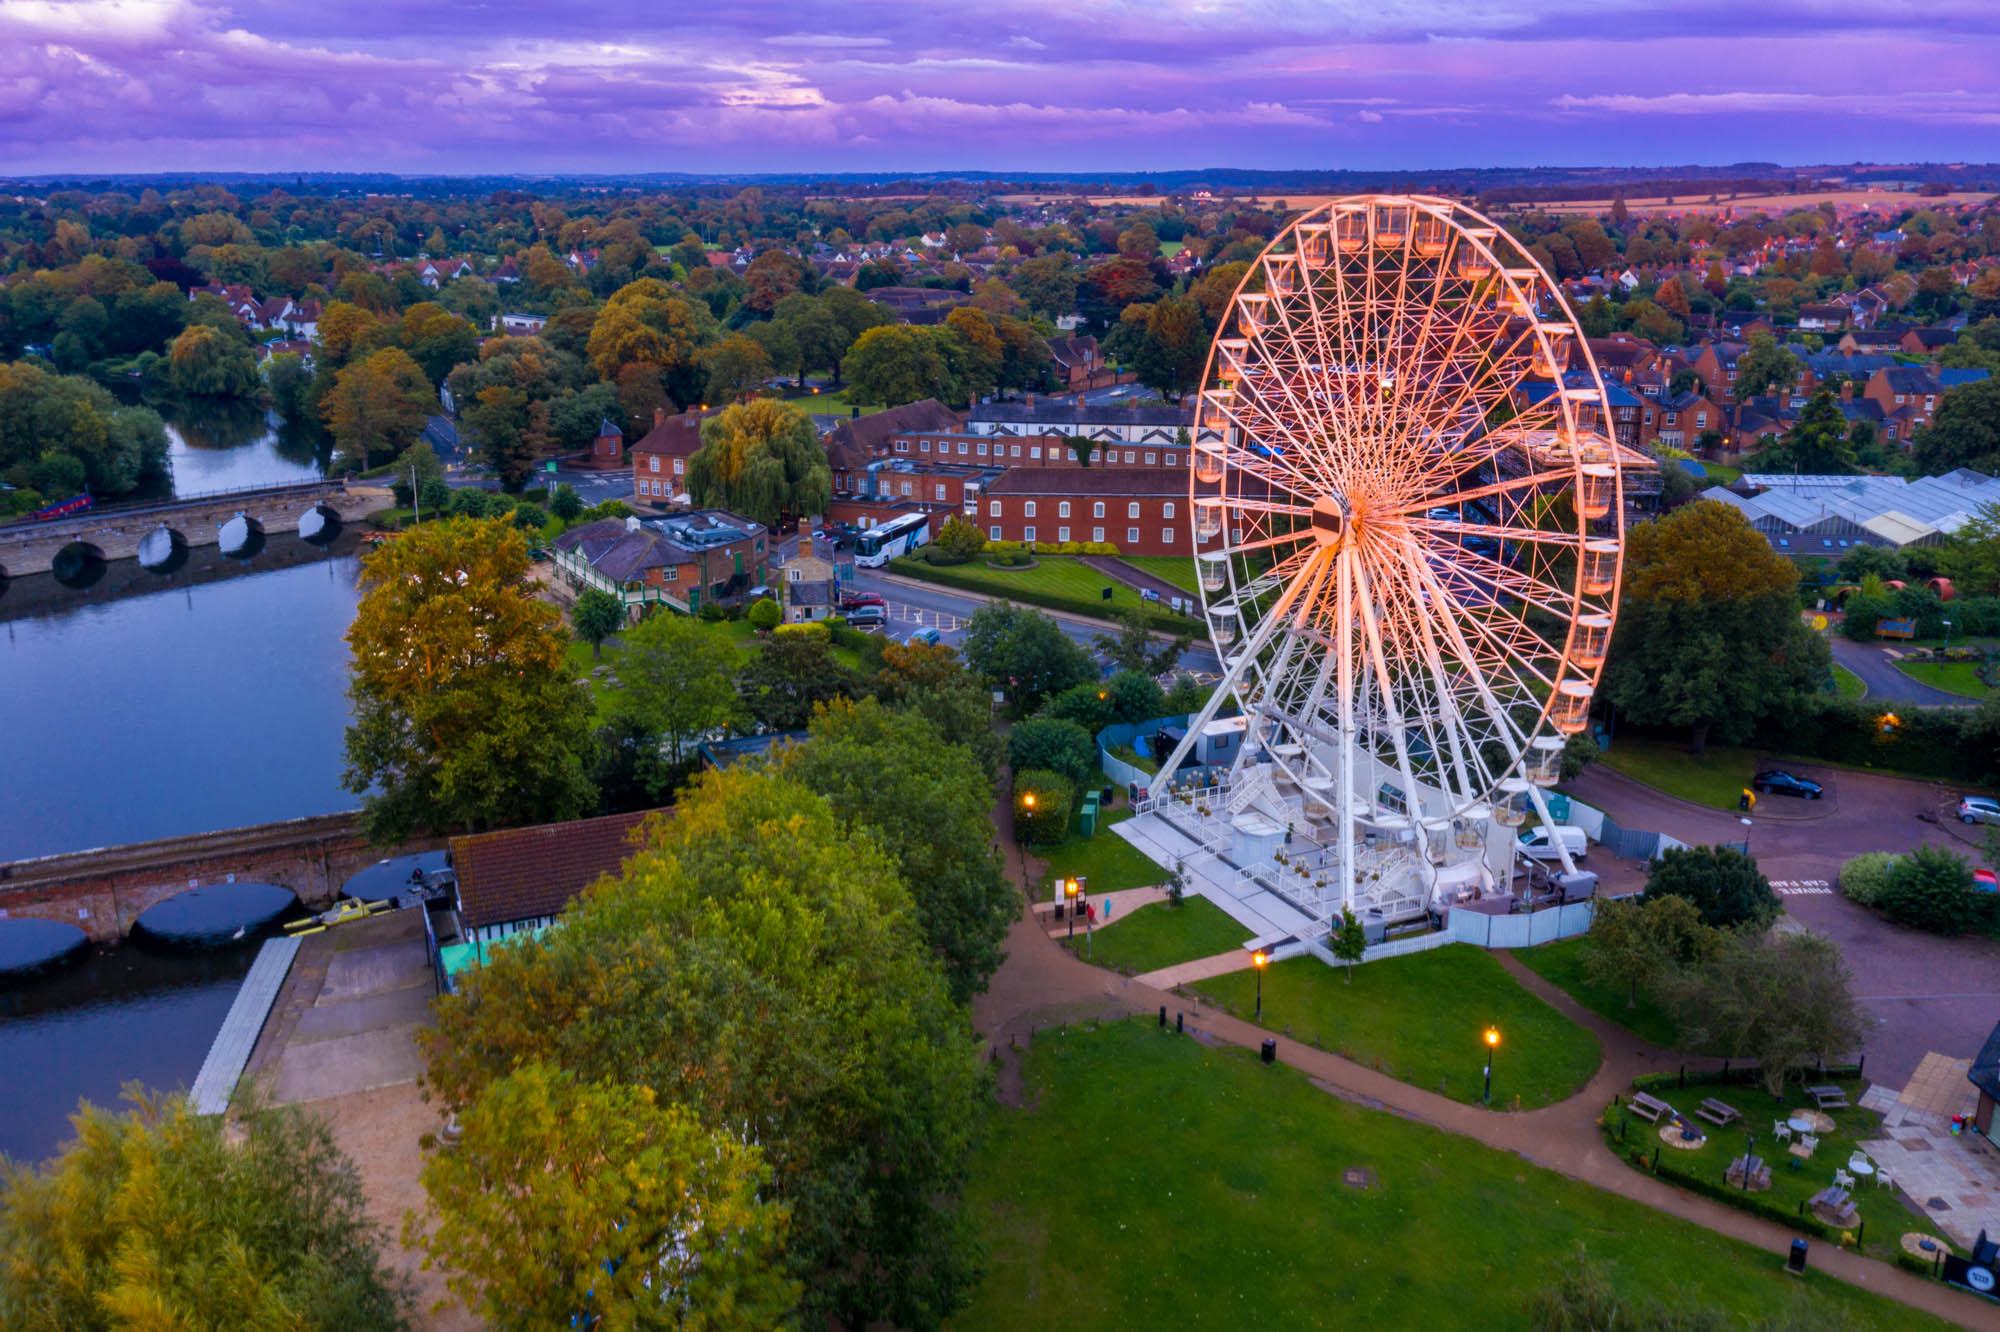 Stratford Ferris Wheel